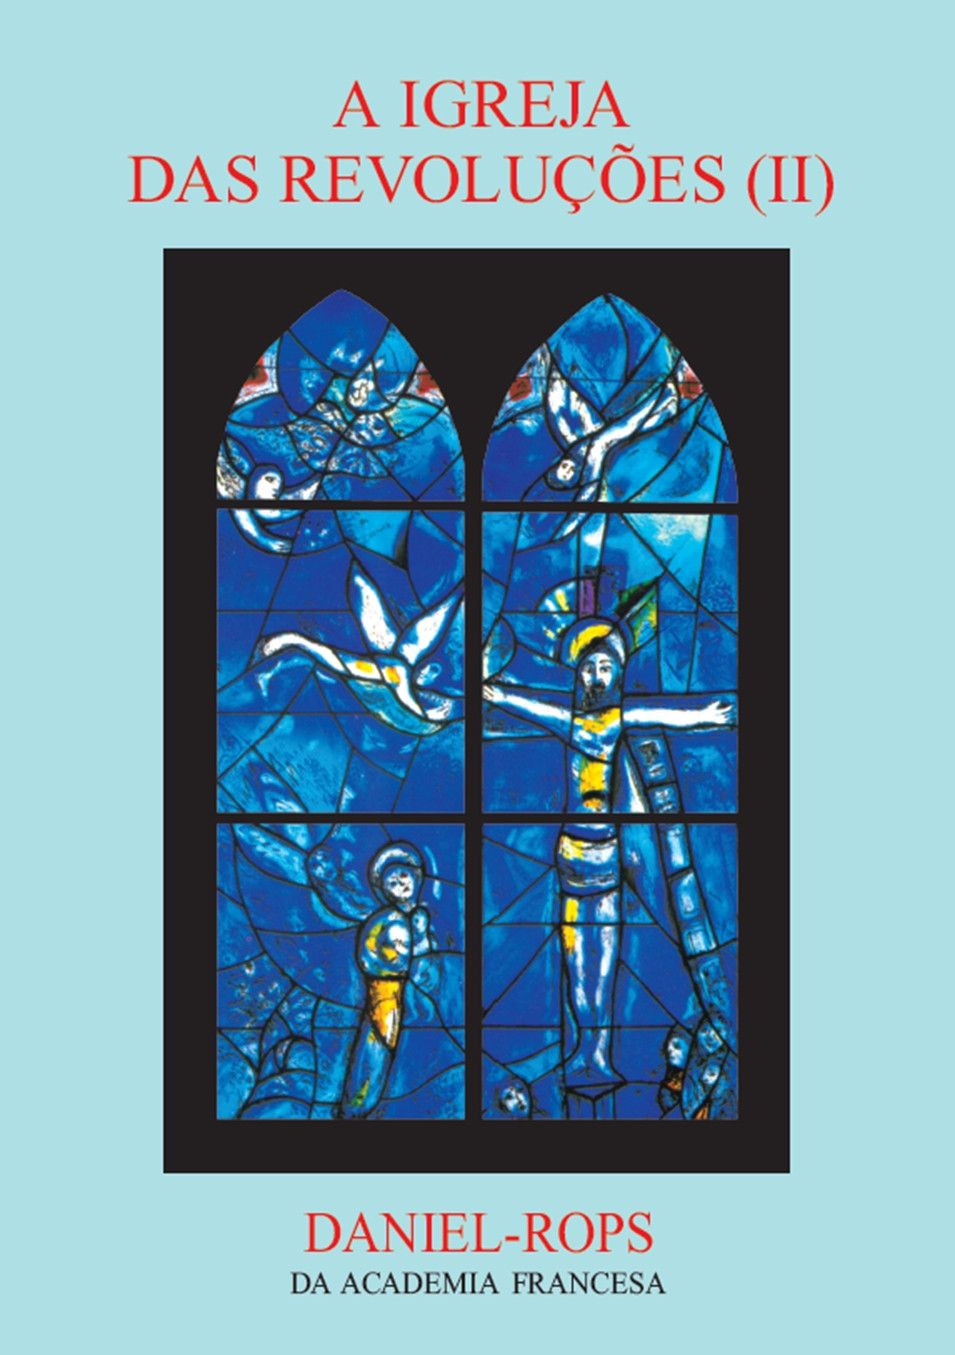 A Igreja das revoluções (II) - Volume IX